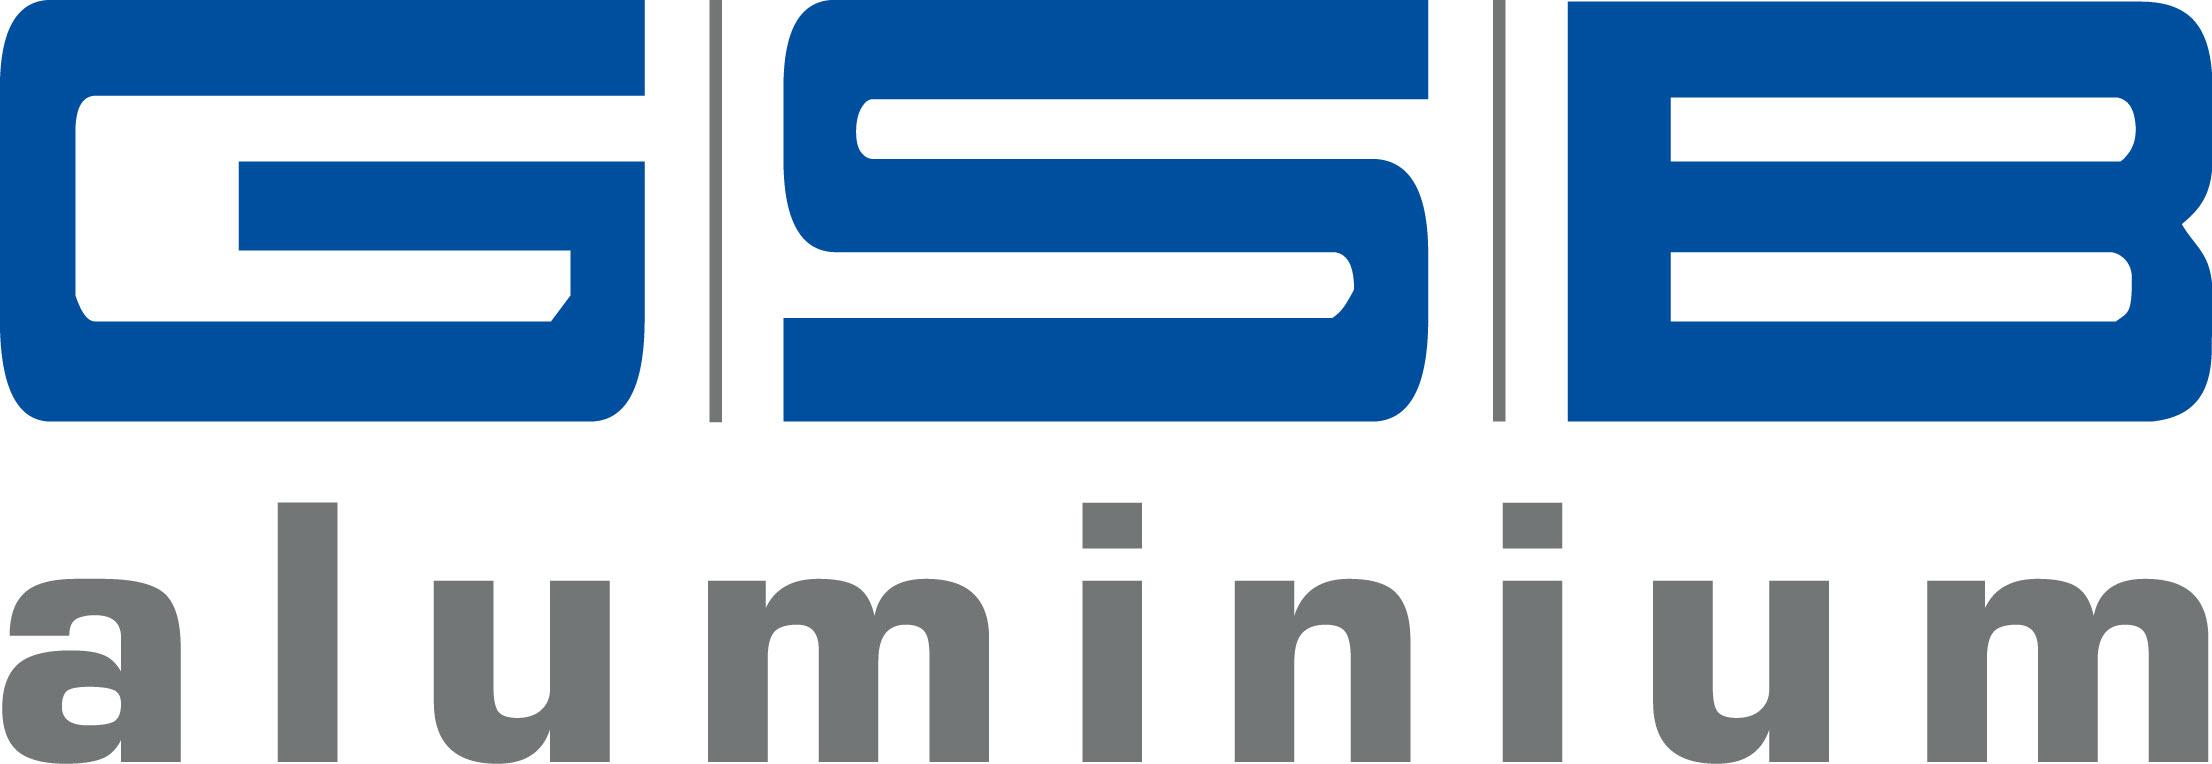 Unternehmens-Logo von GSB Aluminium GmbH